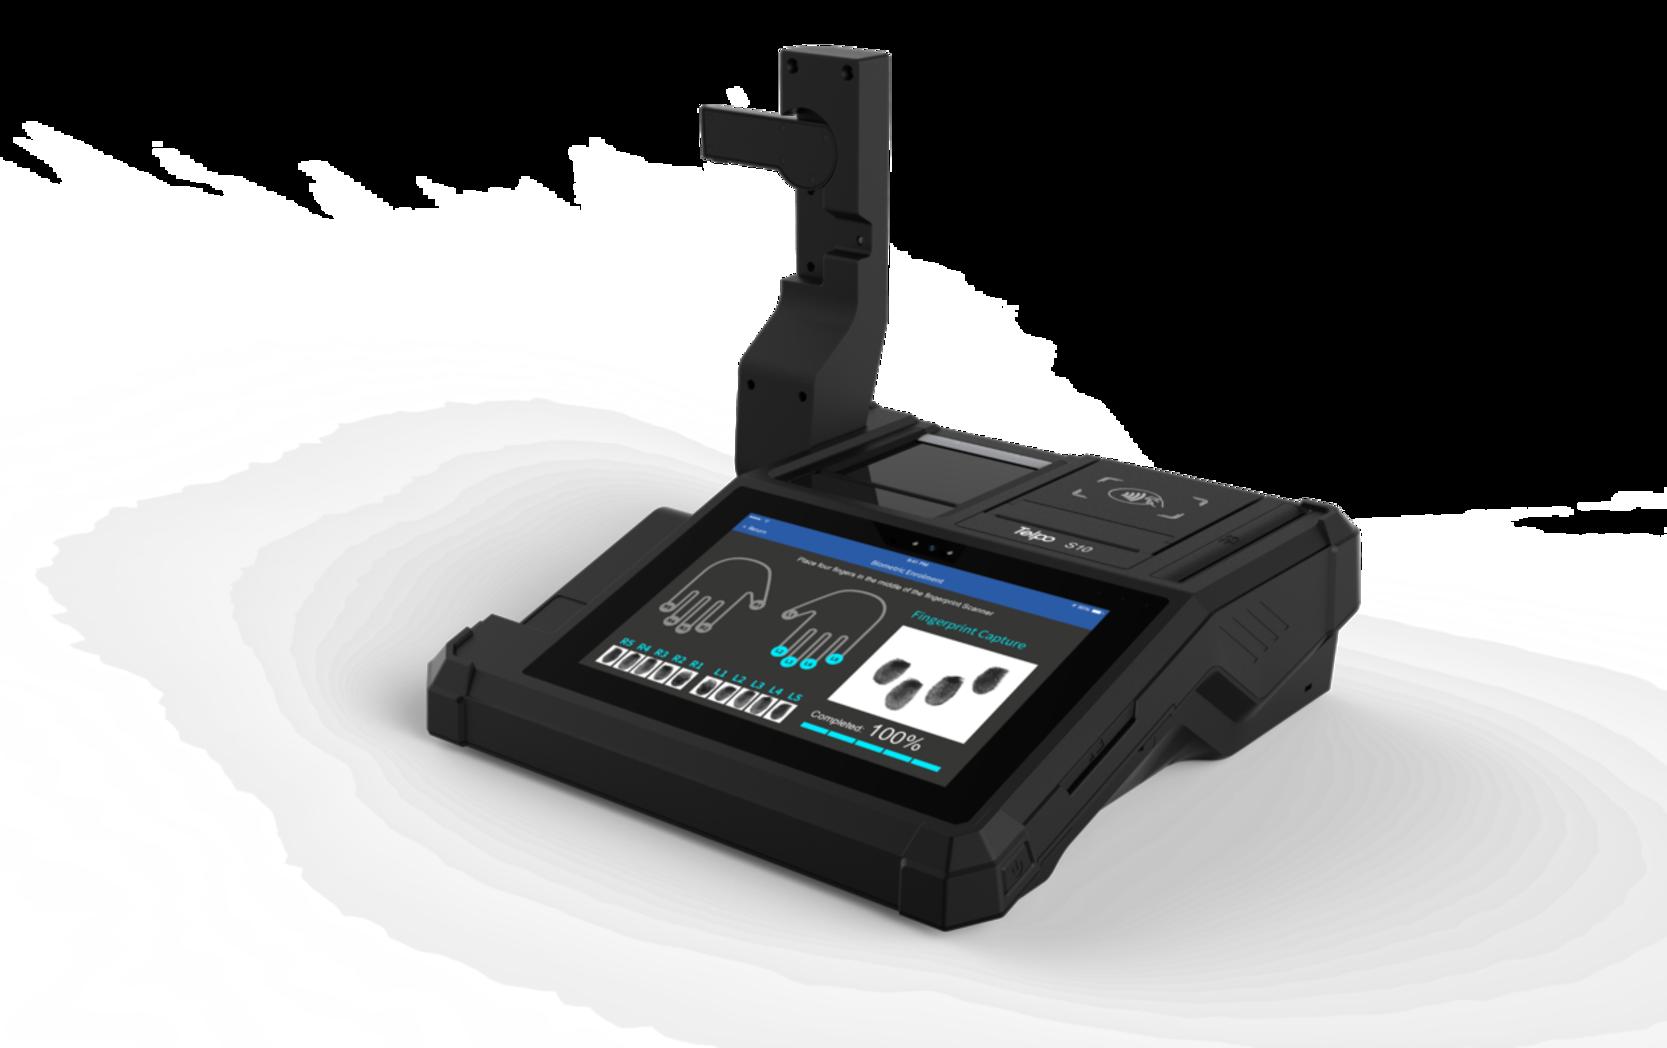 Telpo S10 Biometric Device